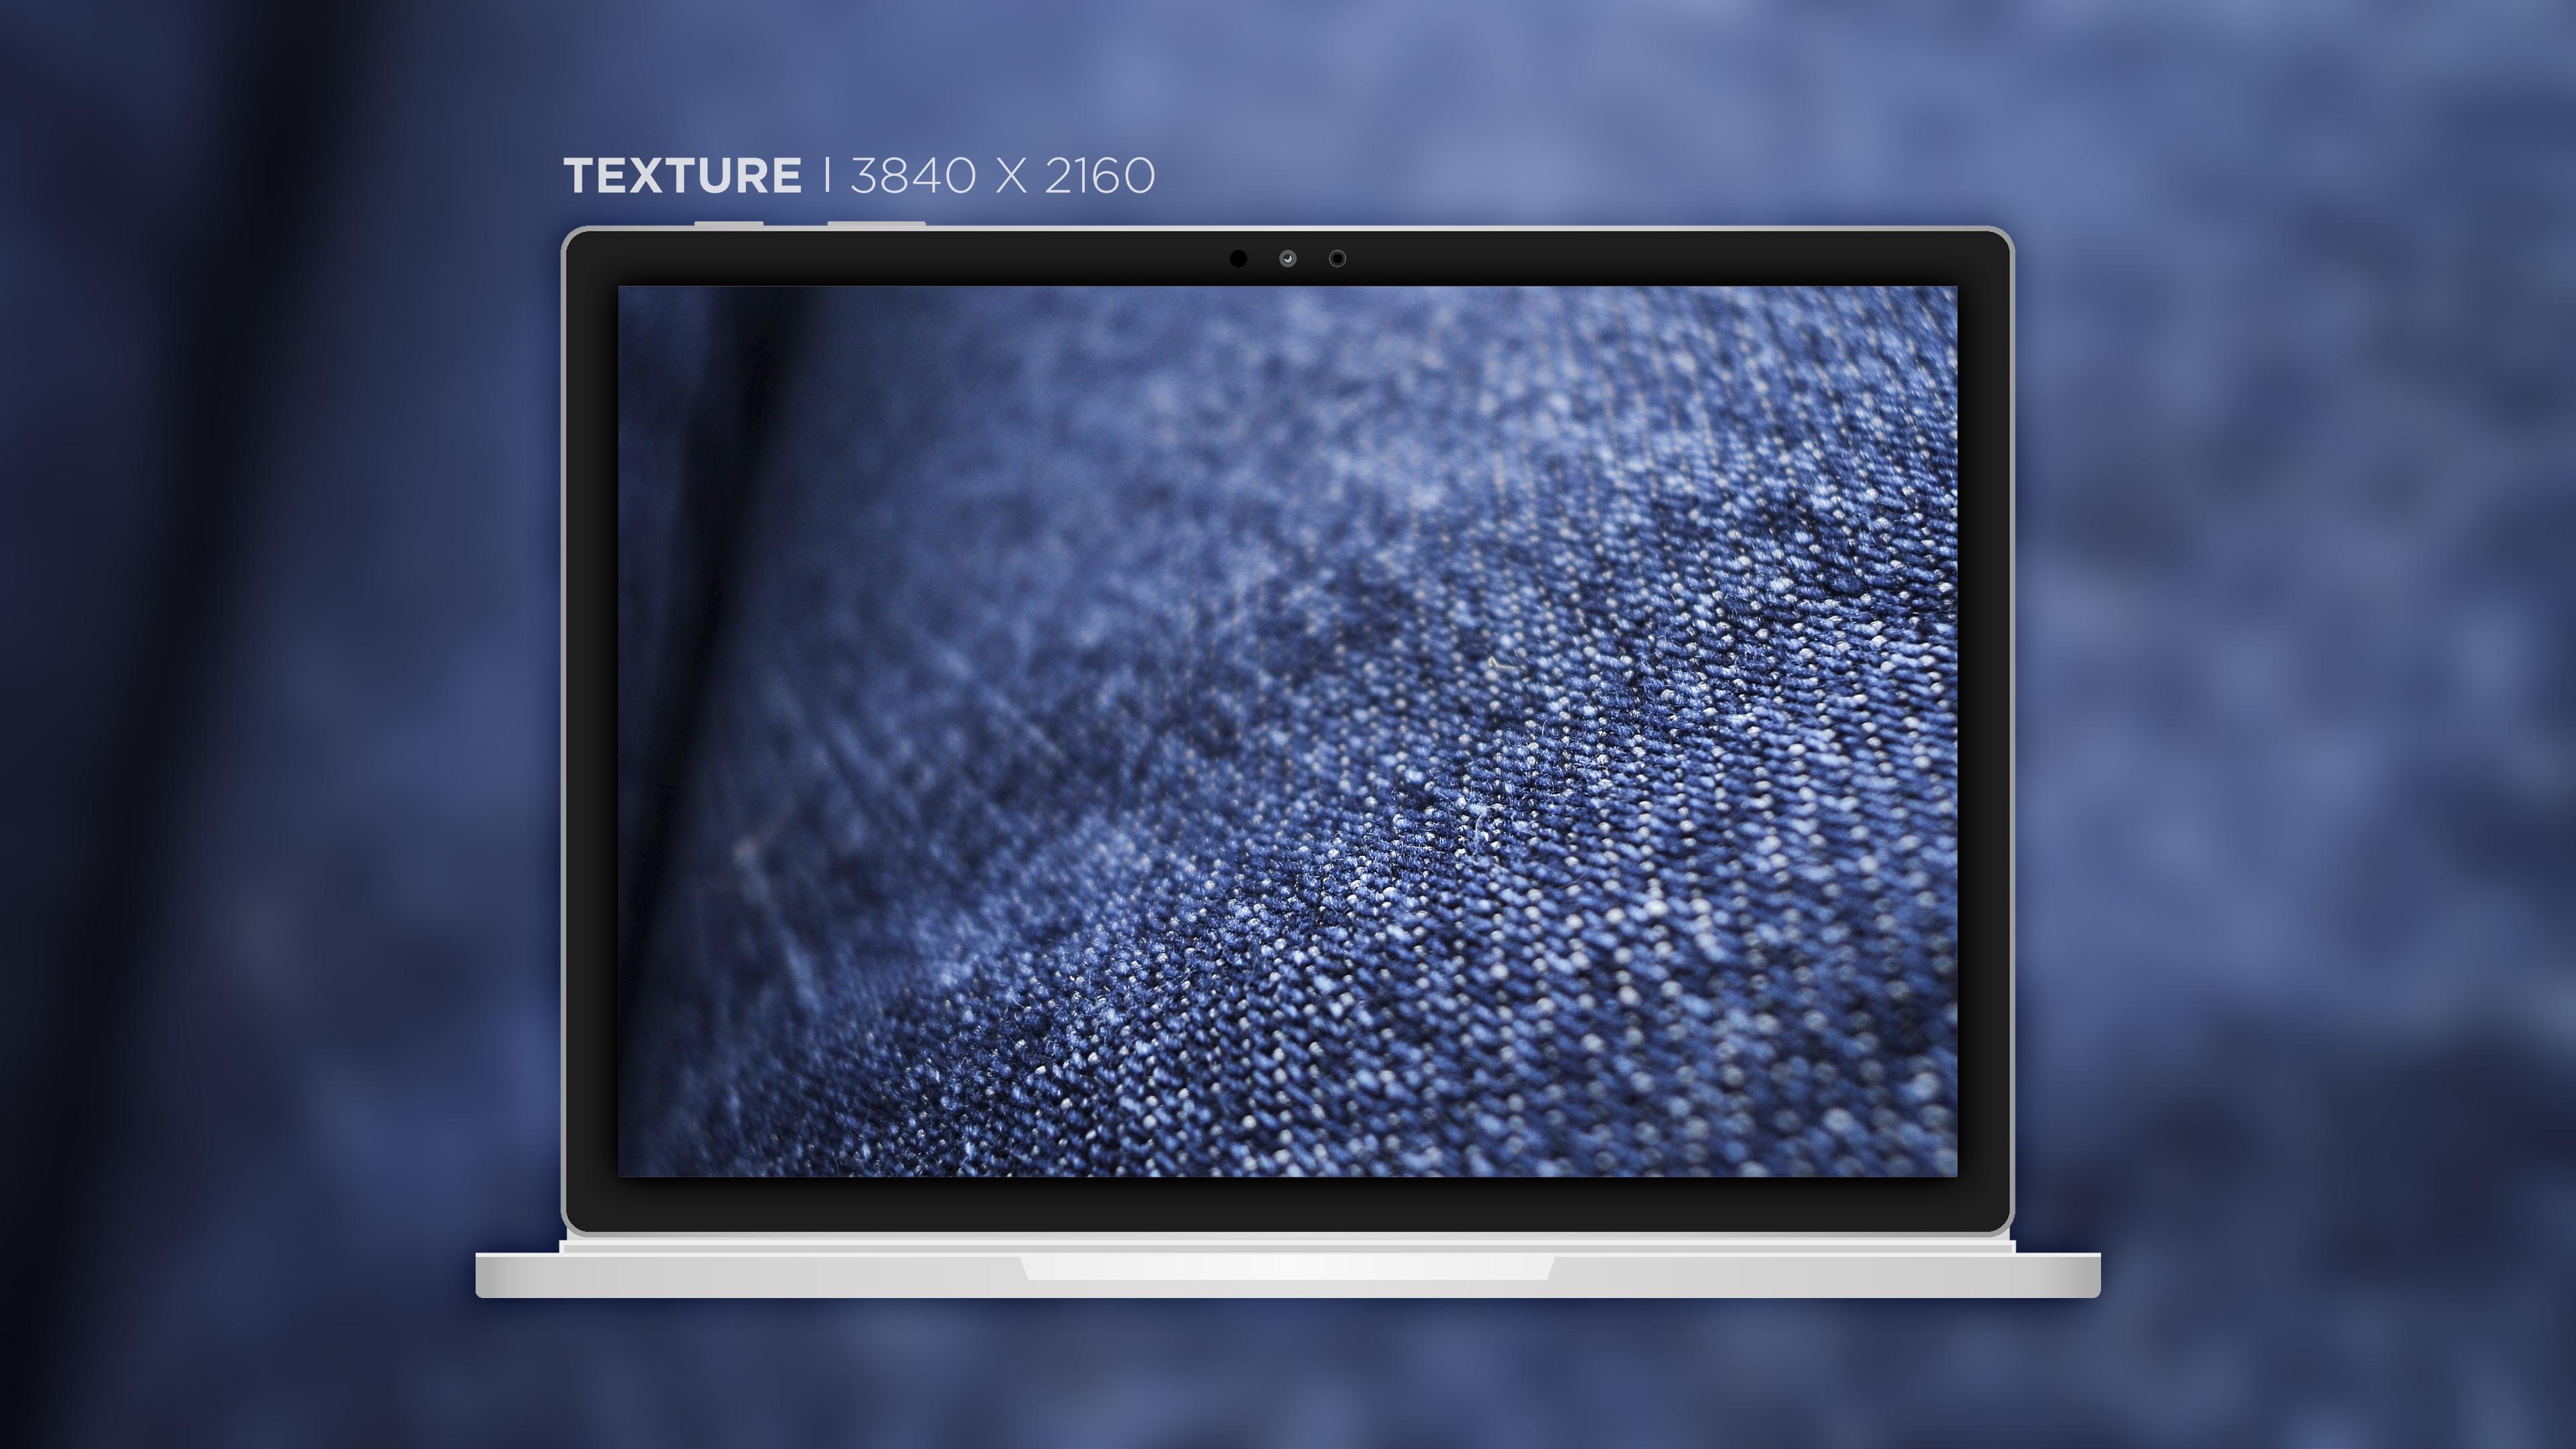 Texture – 4K Wallpaper by MauroTch Texture – 4K Wallpaper by MauroTch